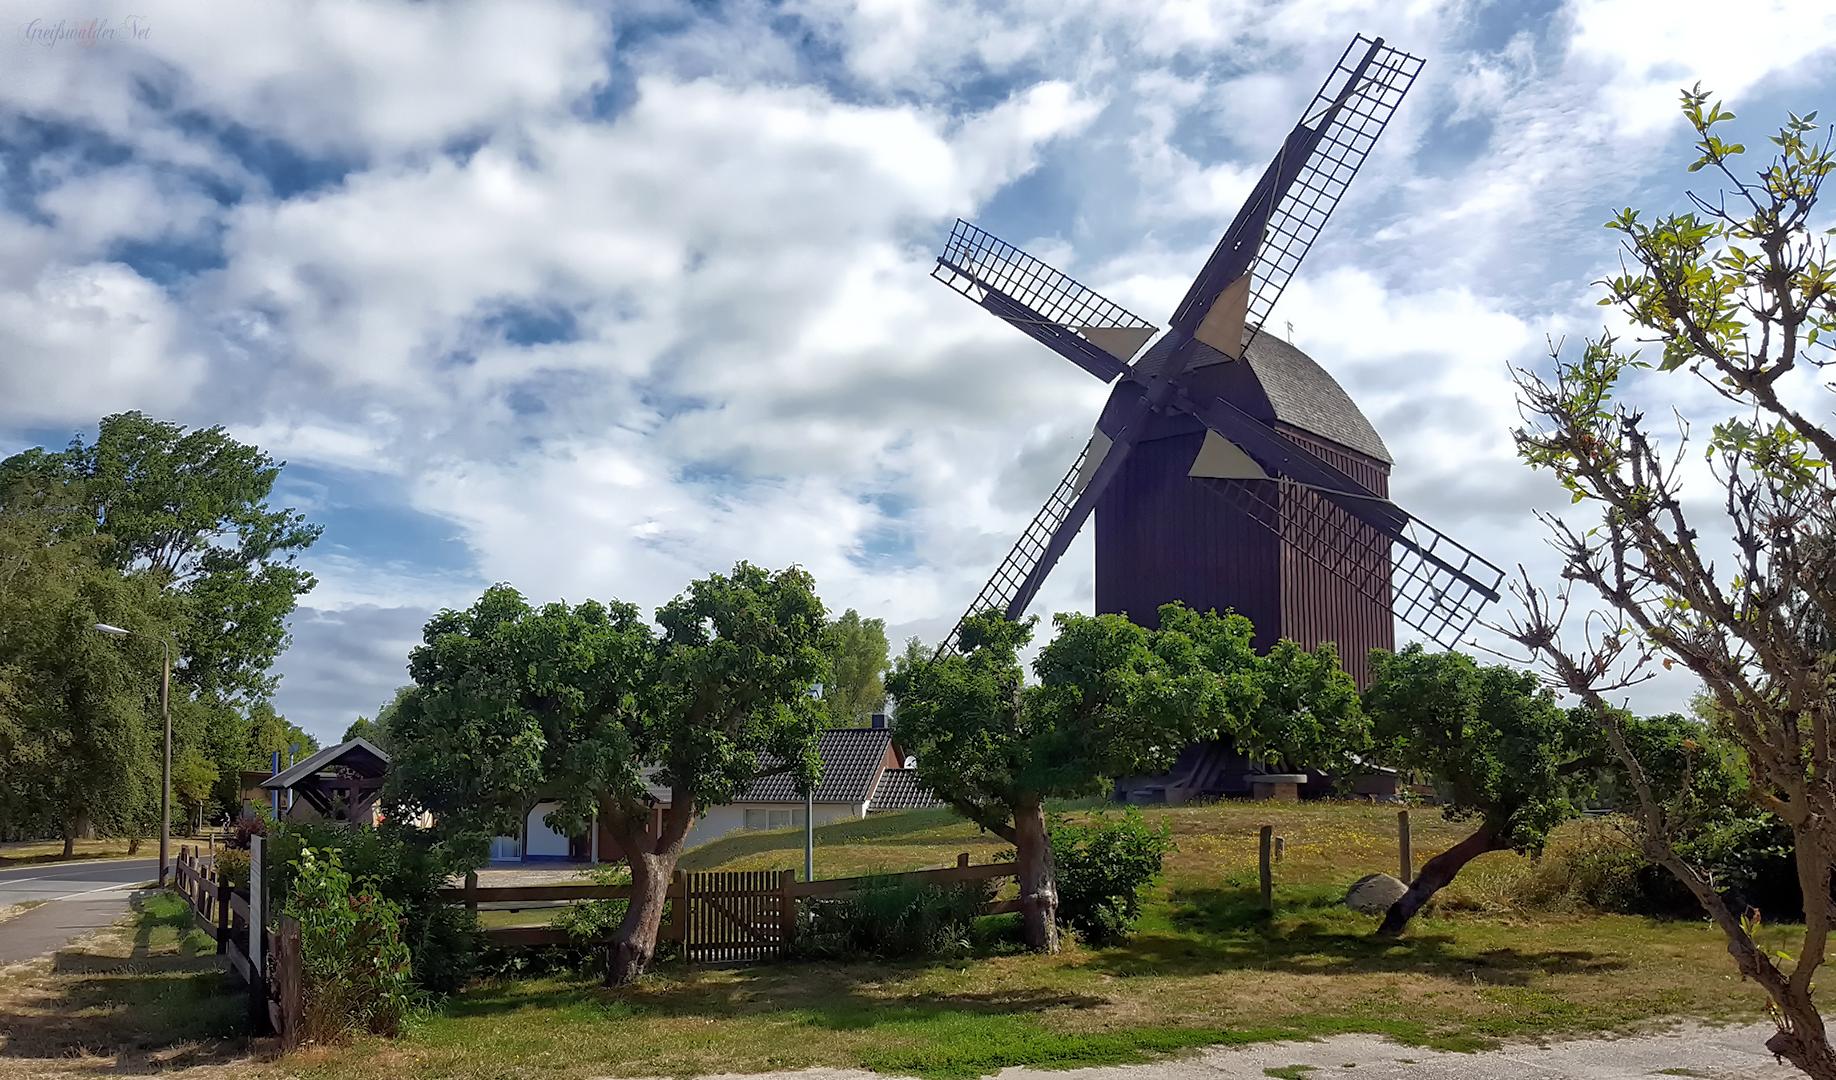 Bockwindmühle in Greifswald-Eldena